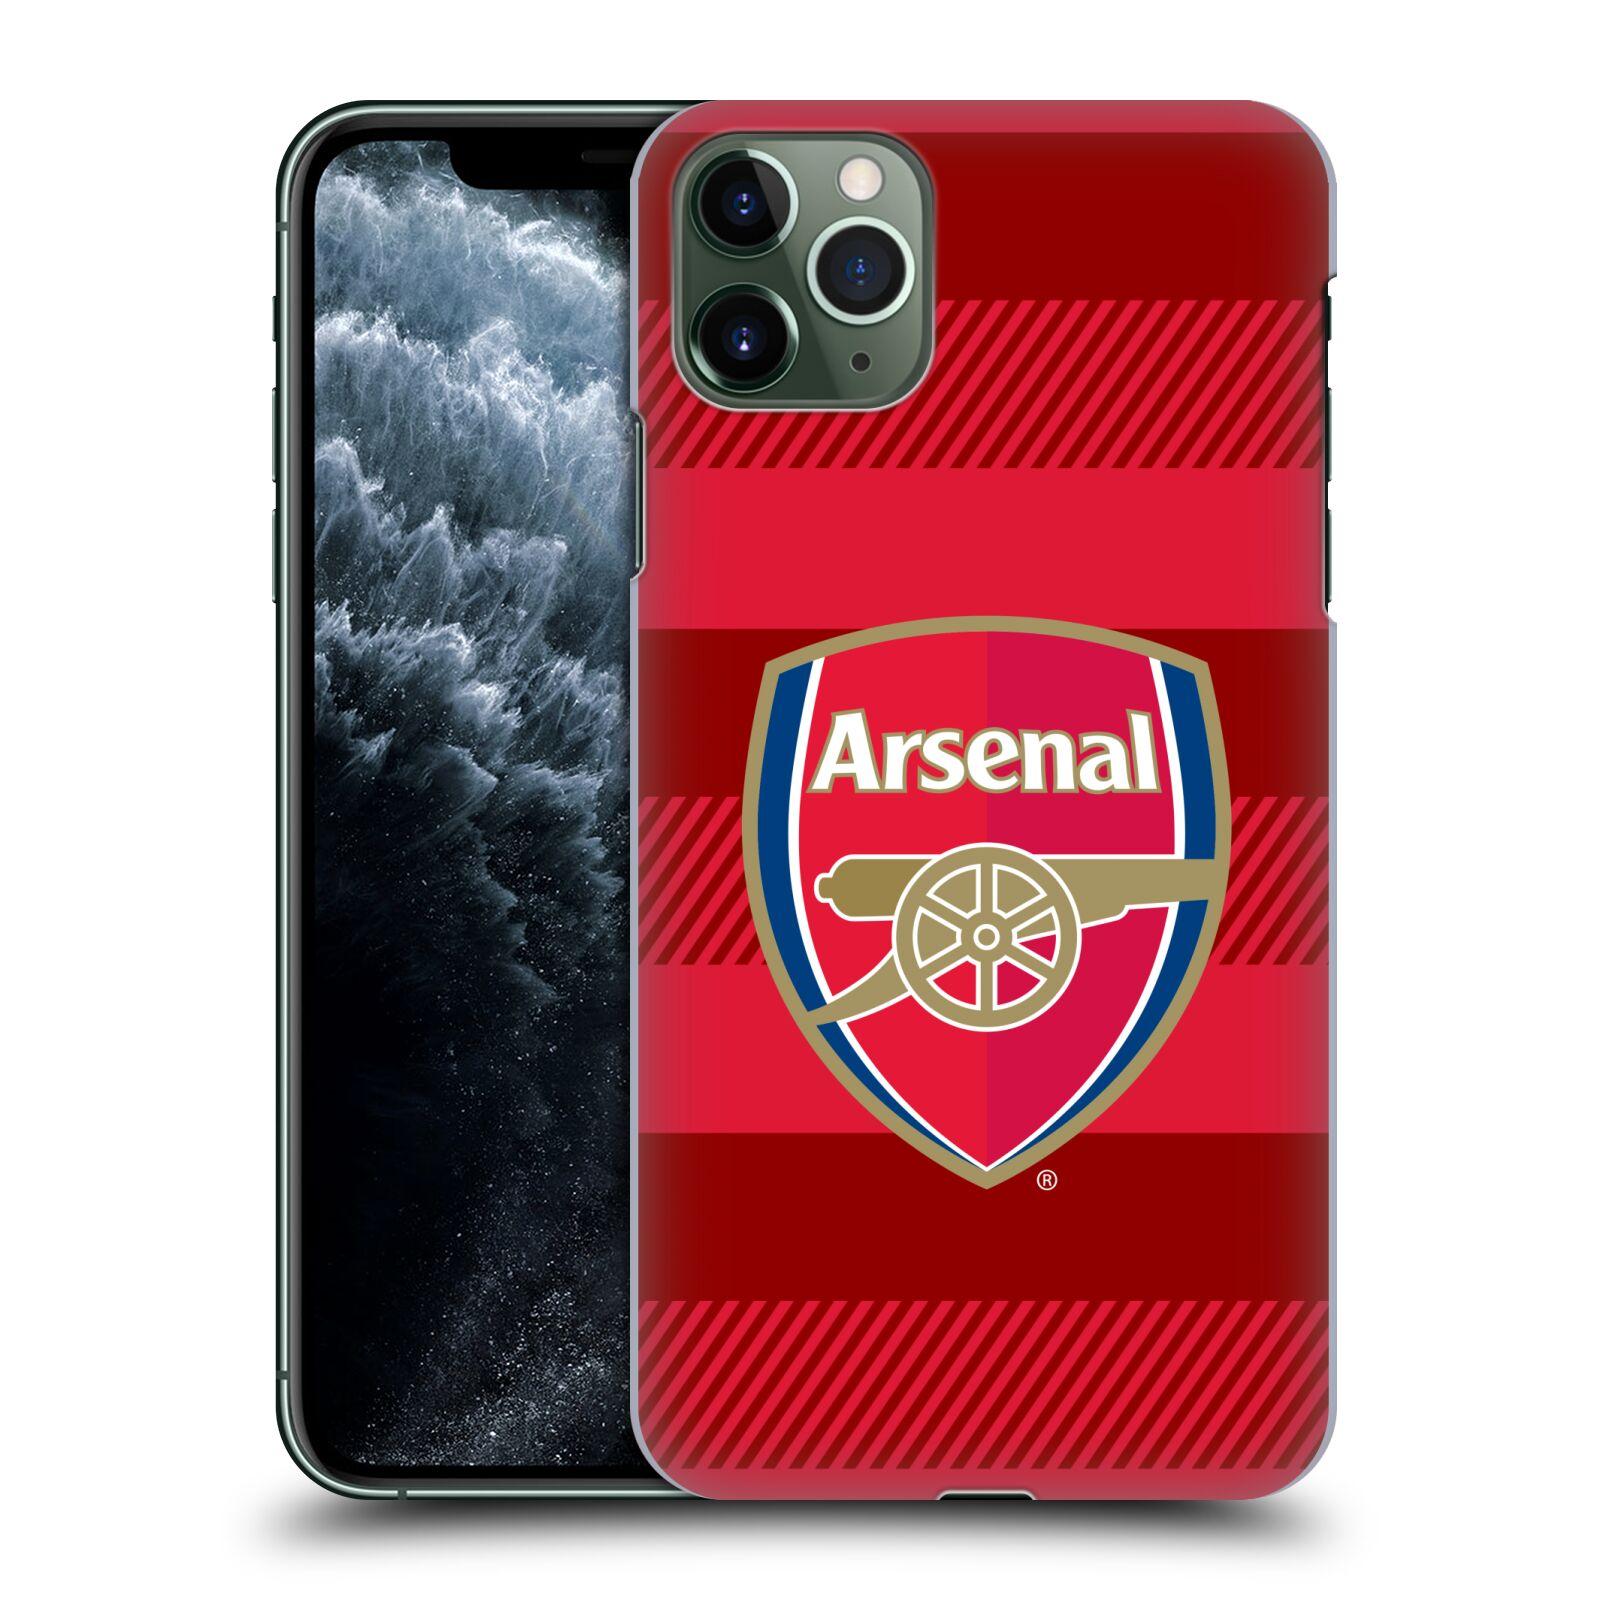 Plastové pouzdro na mobil Apple iPhone 11 Pro Max - Head Case - Arsenal FC - Logo s pruhy